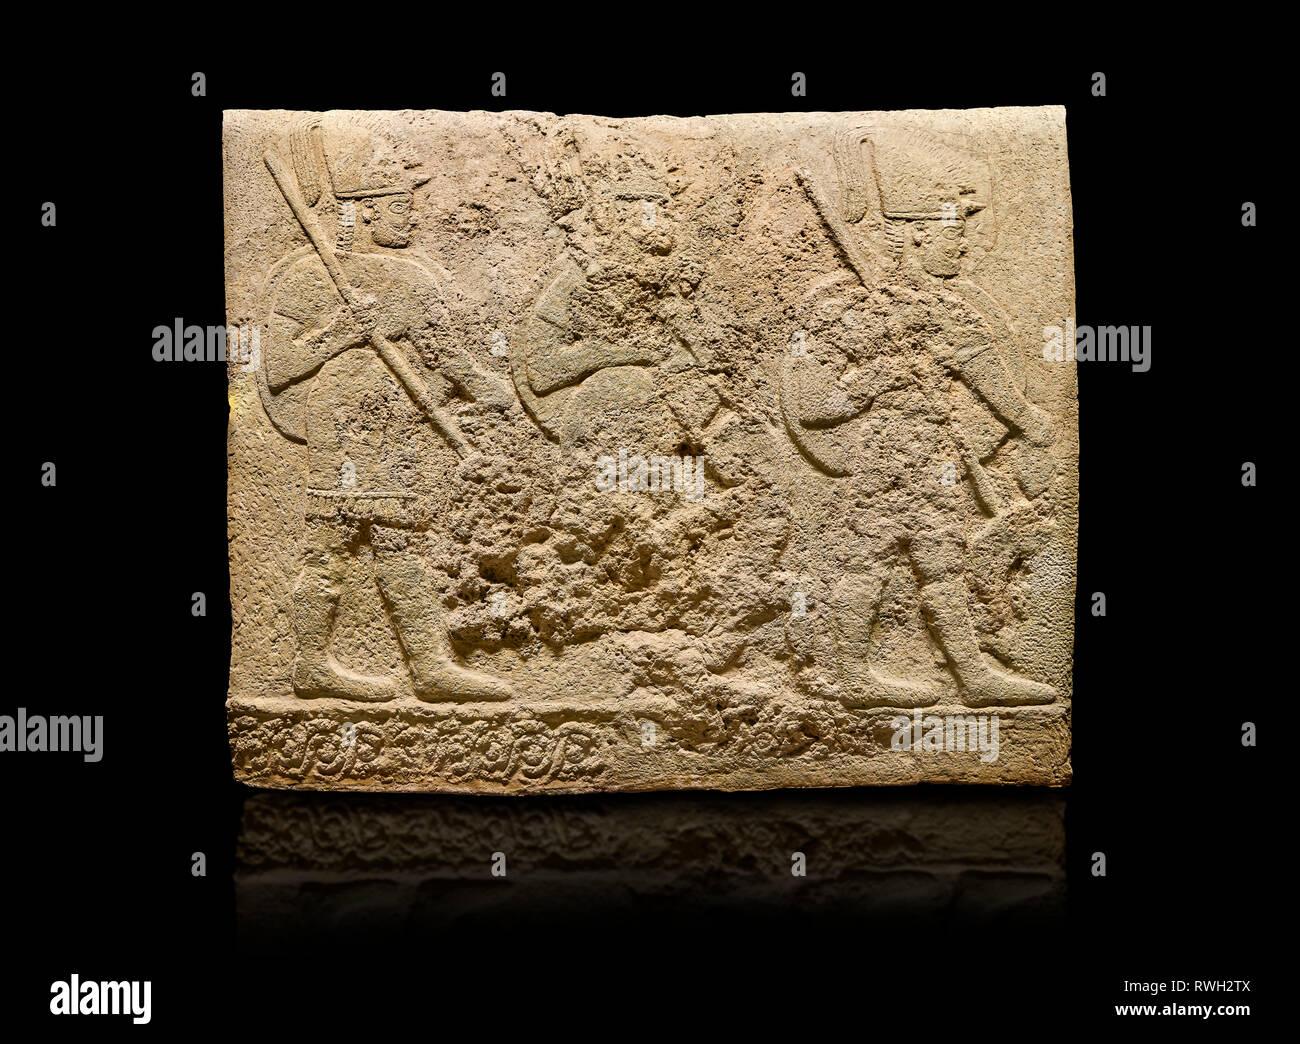 Hittite sculpted orthostats of Long Wall Limestone, Karkamıs, (Kargamıs), Carchemish (Karkemish), 900-700 BC. Anatolian Civilisations Museum, Ankara,  Stock Photo